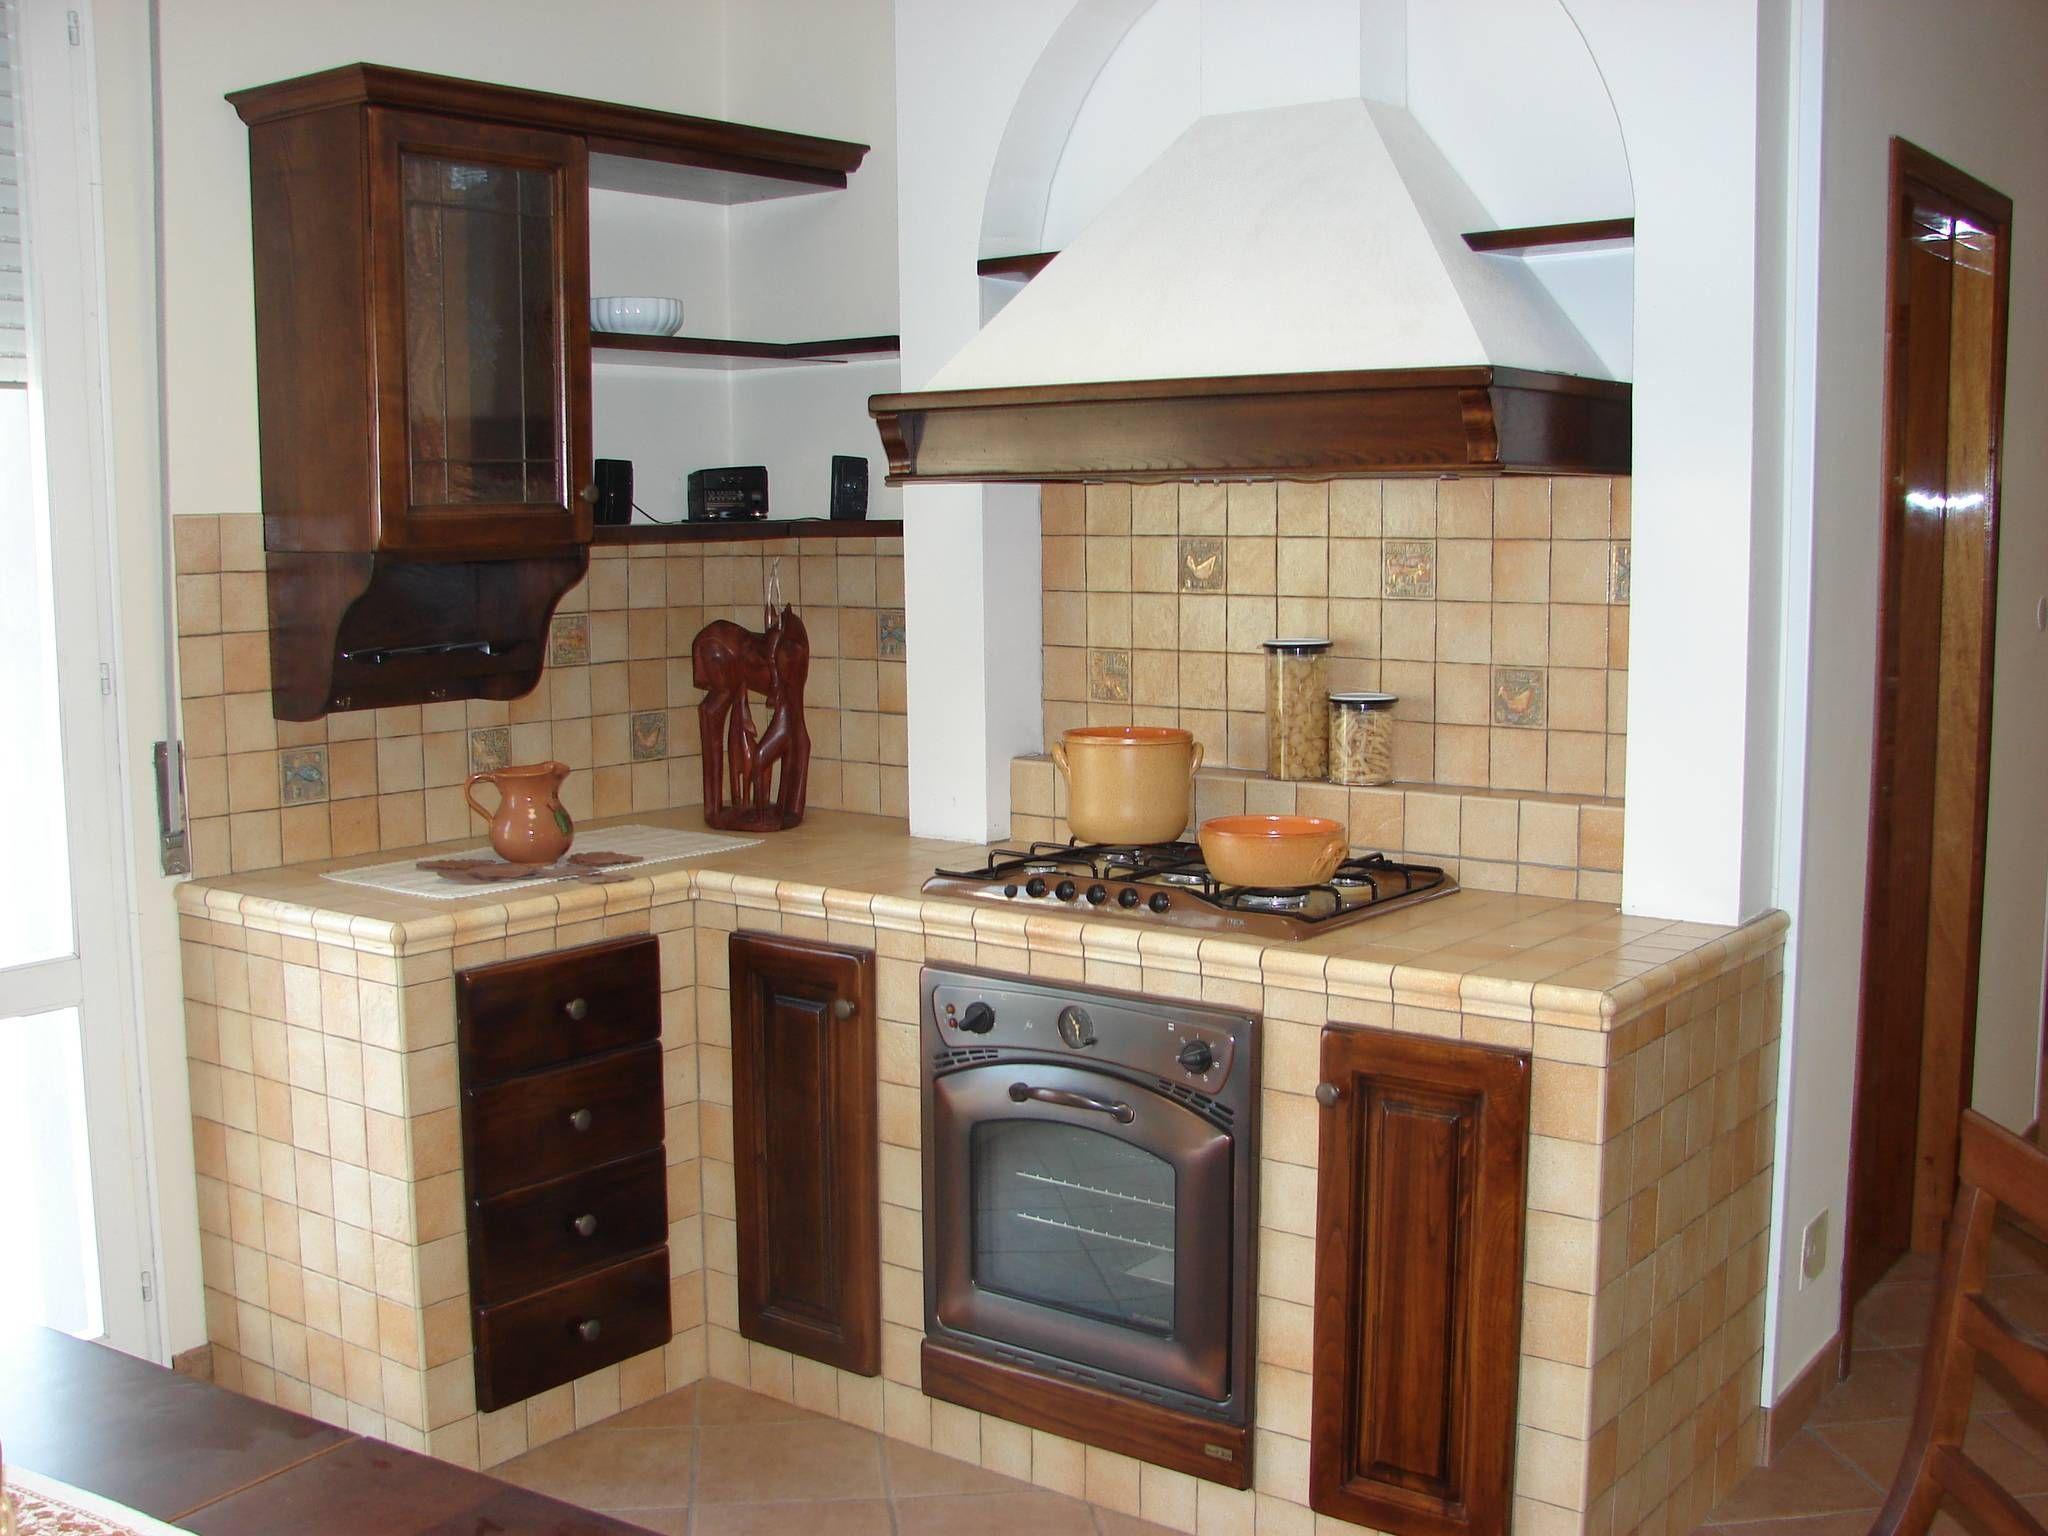 cucina muratura piccola - Поиск в Google | madera | Pinterest ...